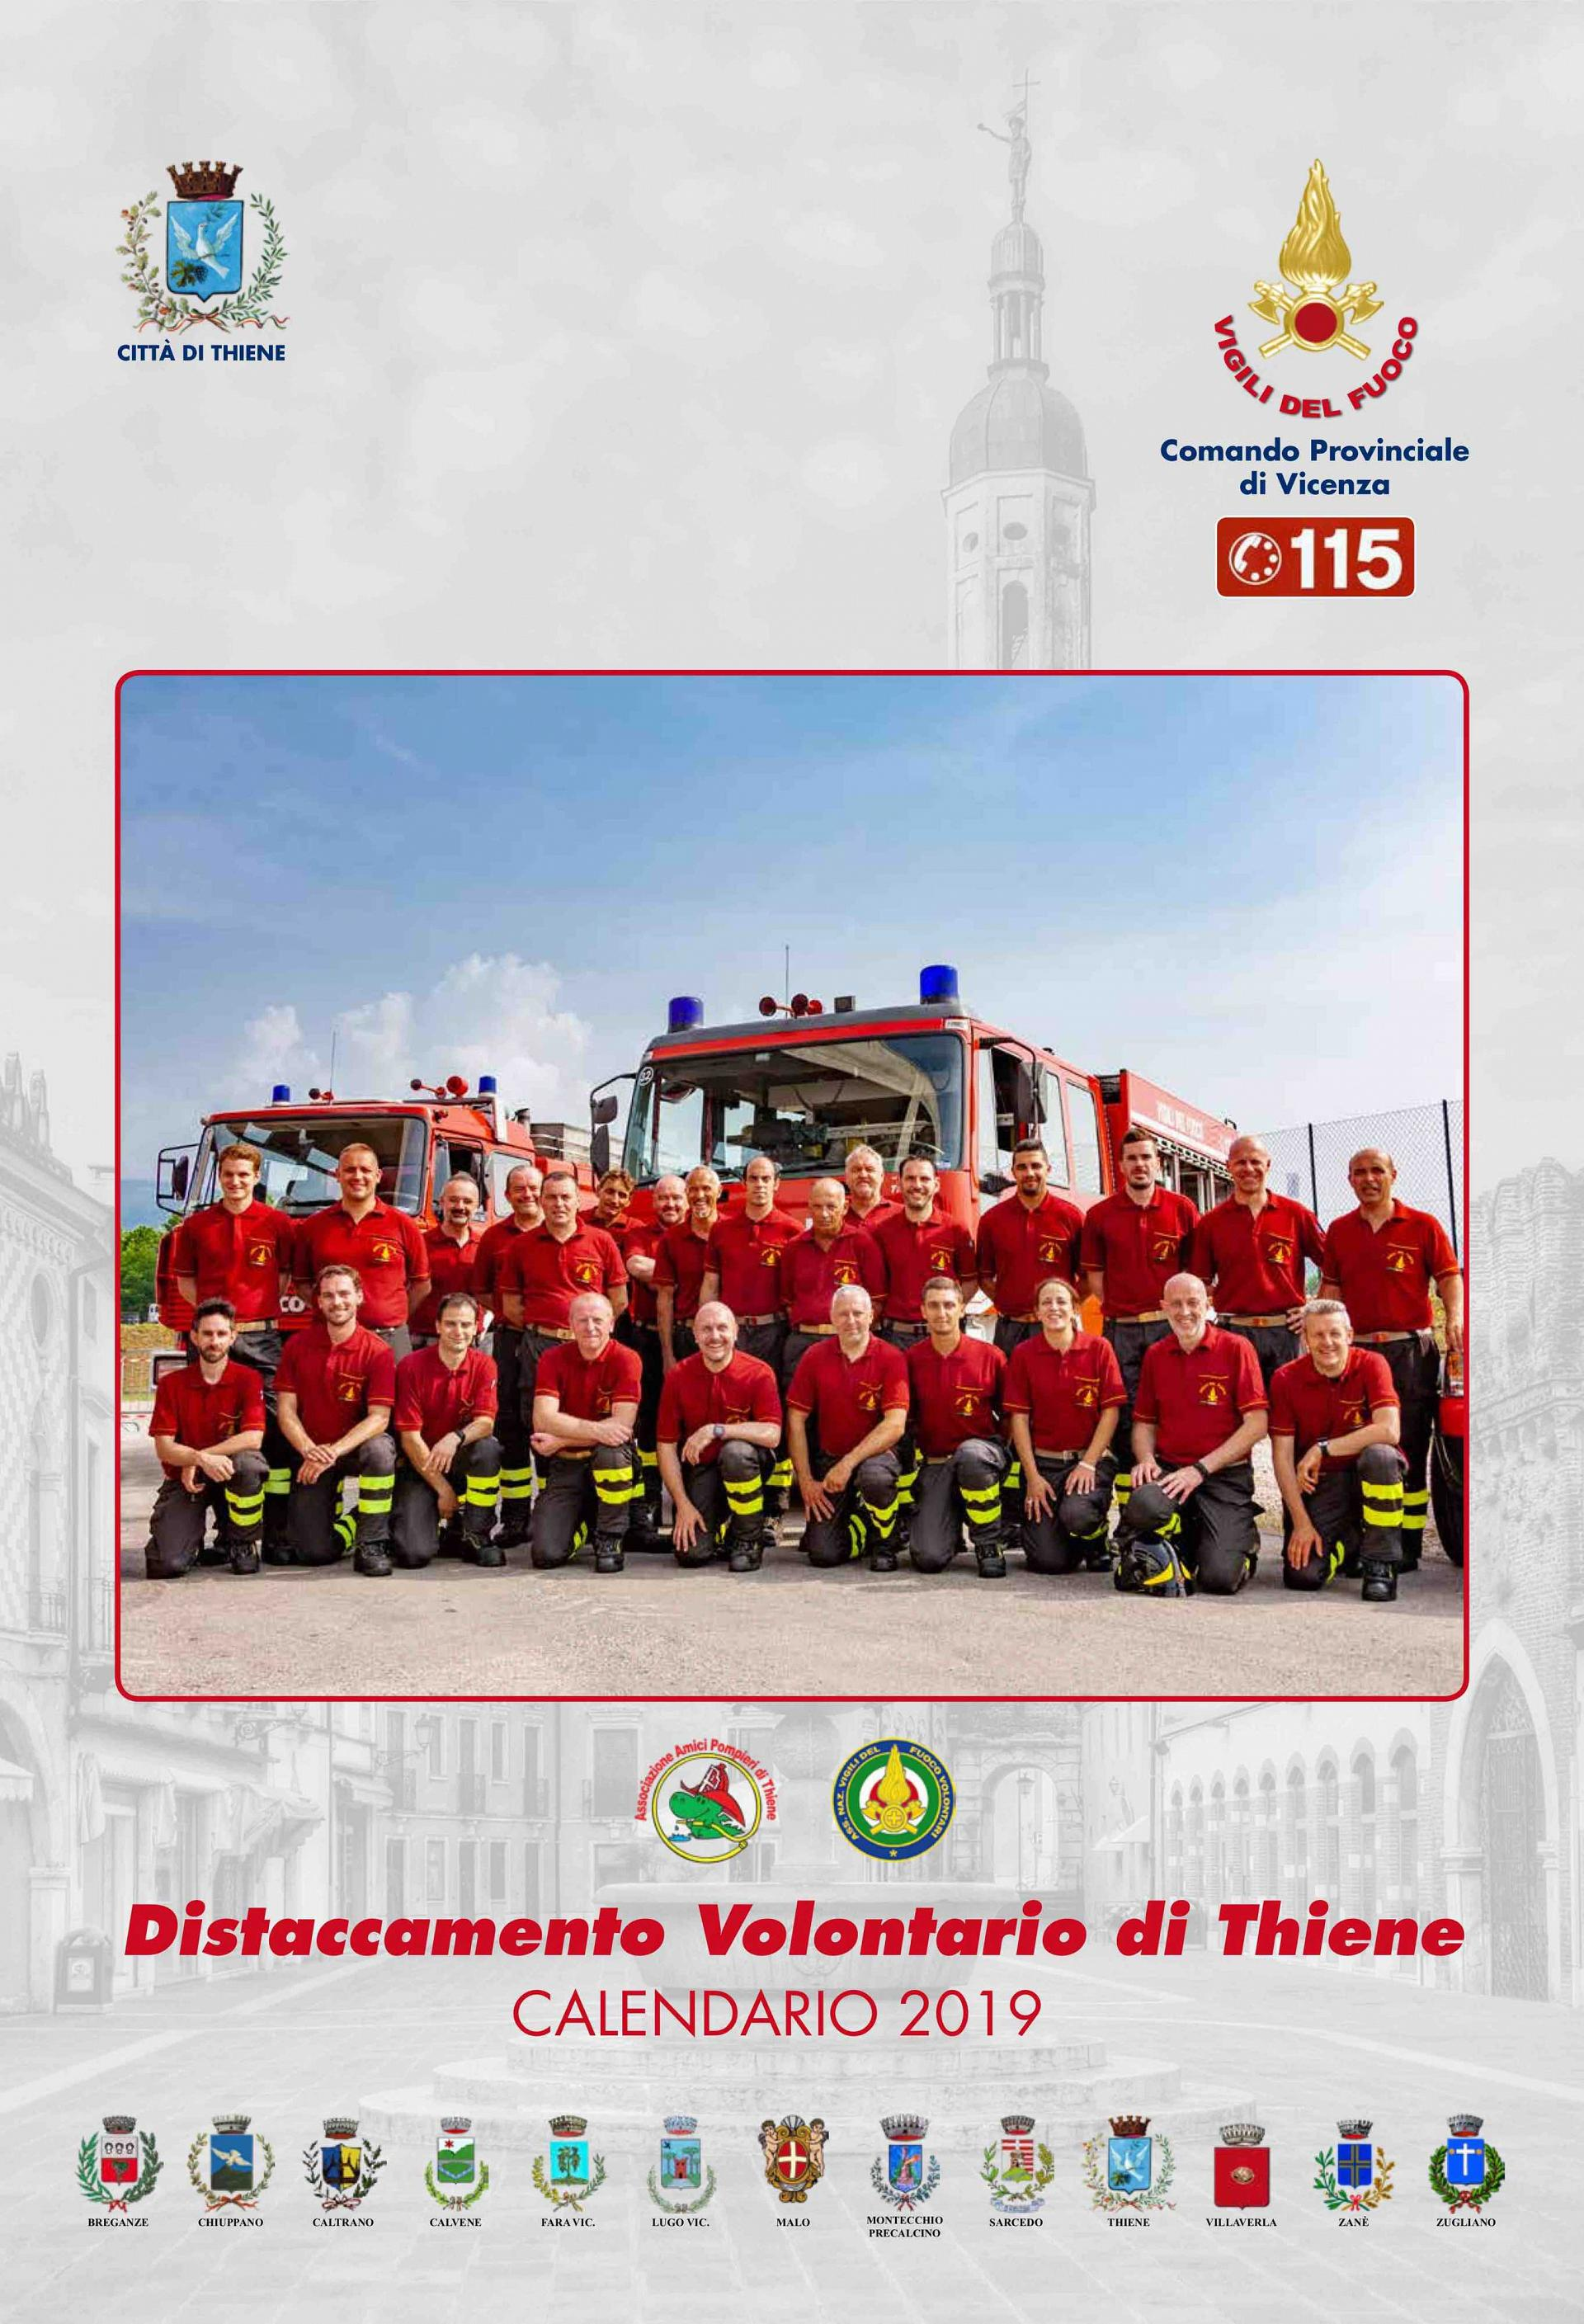 Calendario Vicenza.Vigili Del Fuoco Distaccamento Volontario Di Thiene